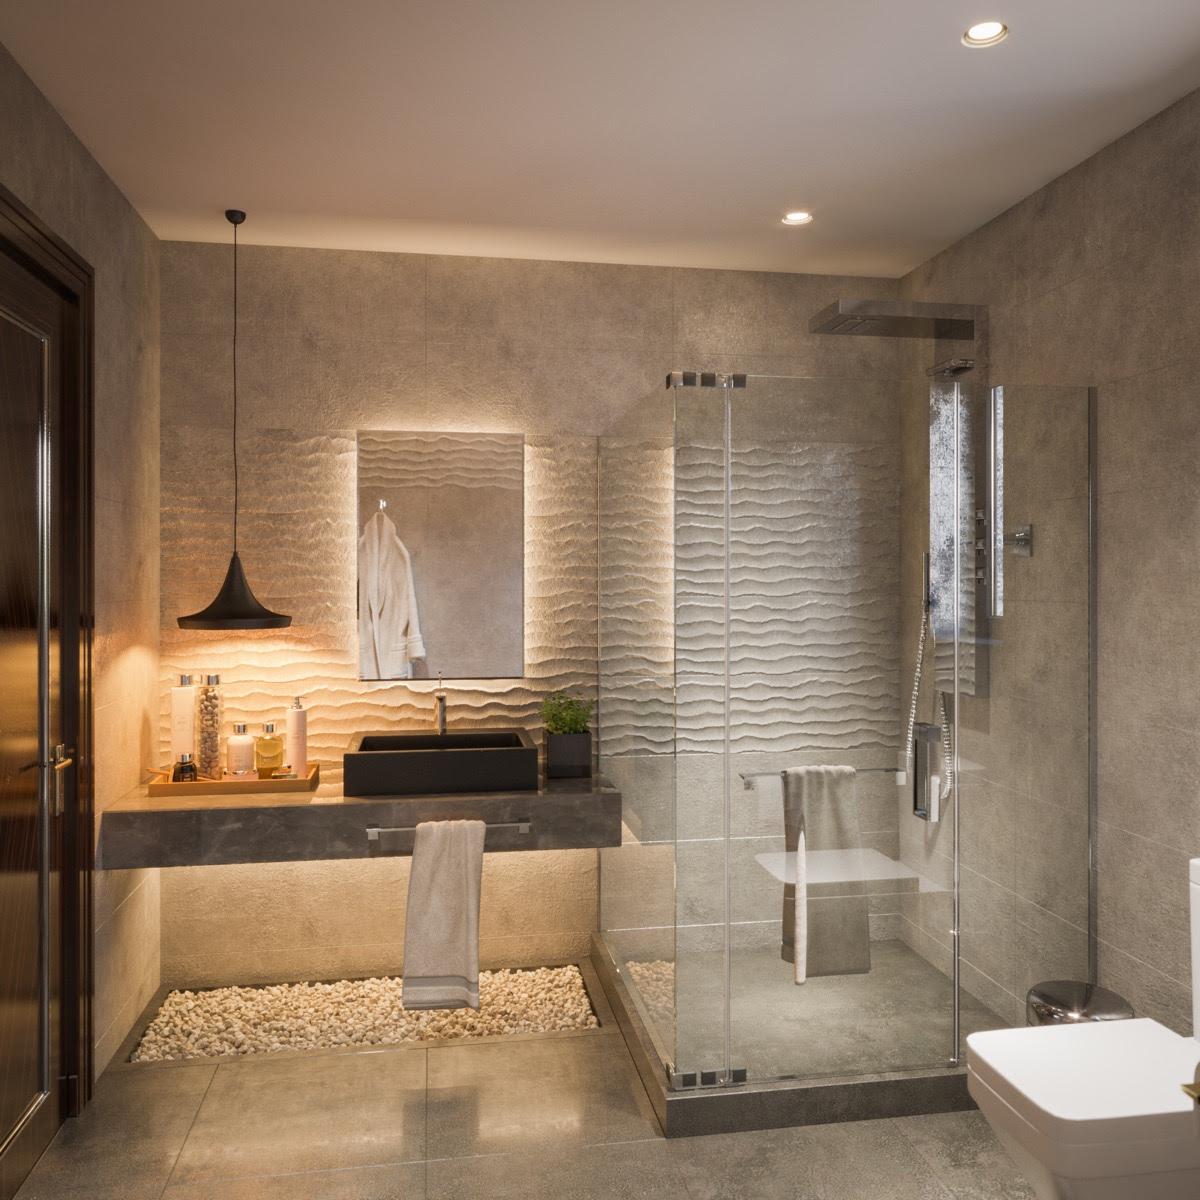 Bathroom Design Images Shreenad Home